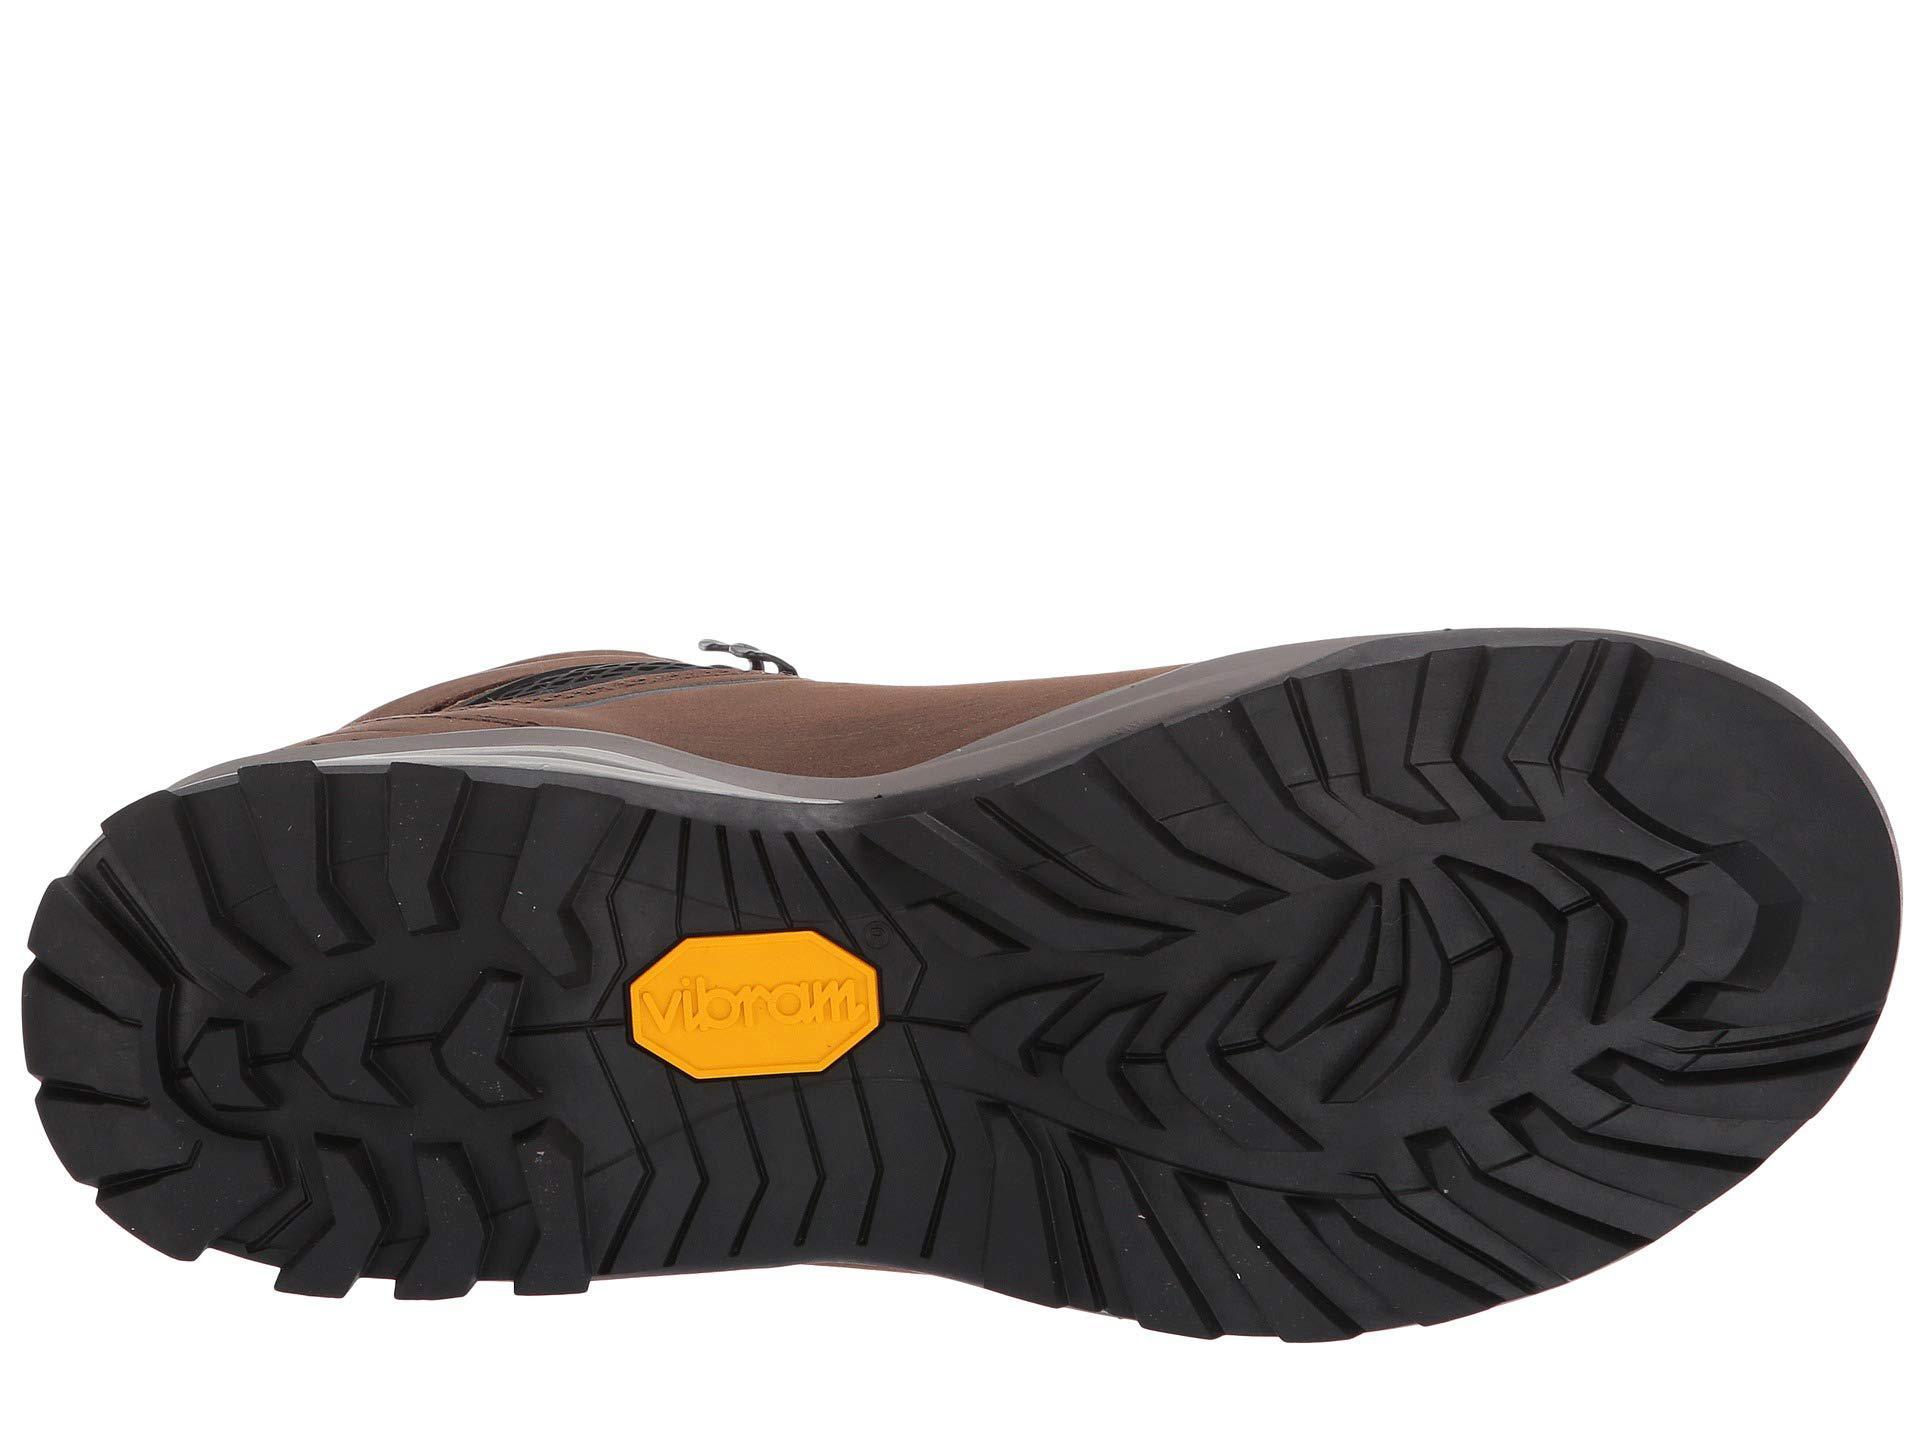 b3757d5dbbc Brown Canyonlands Ultradrytm (bungee Cord/rum Raisin) Women's Shoes